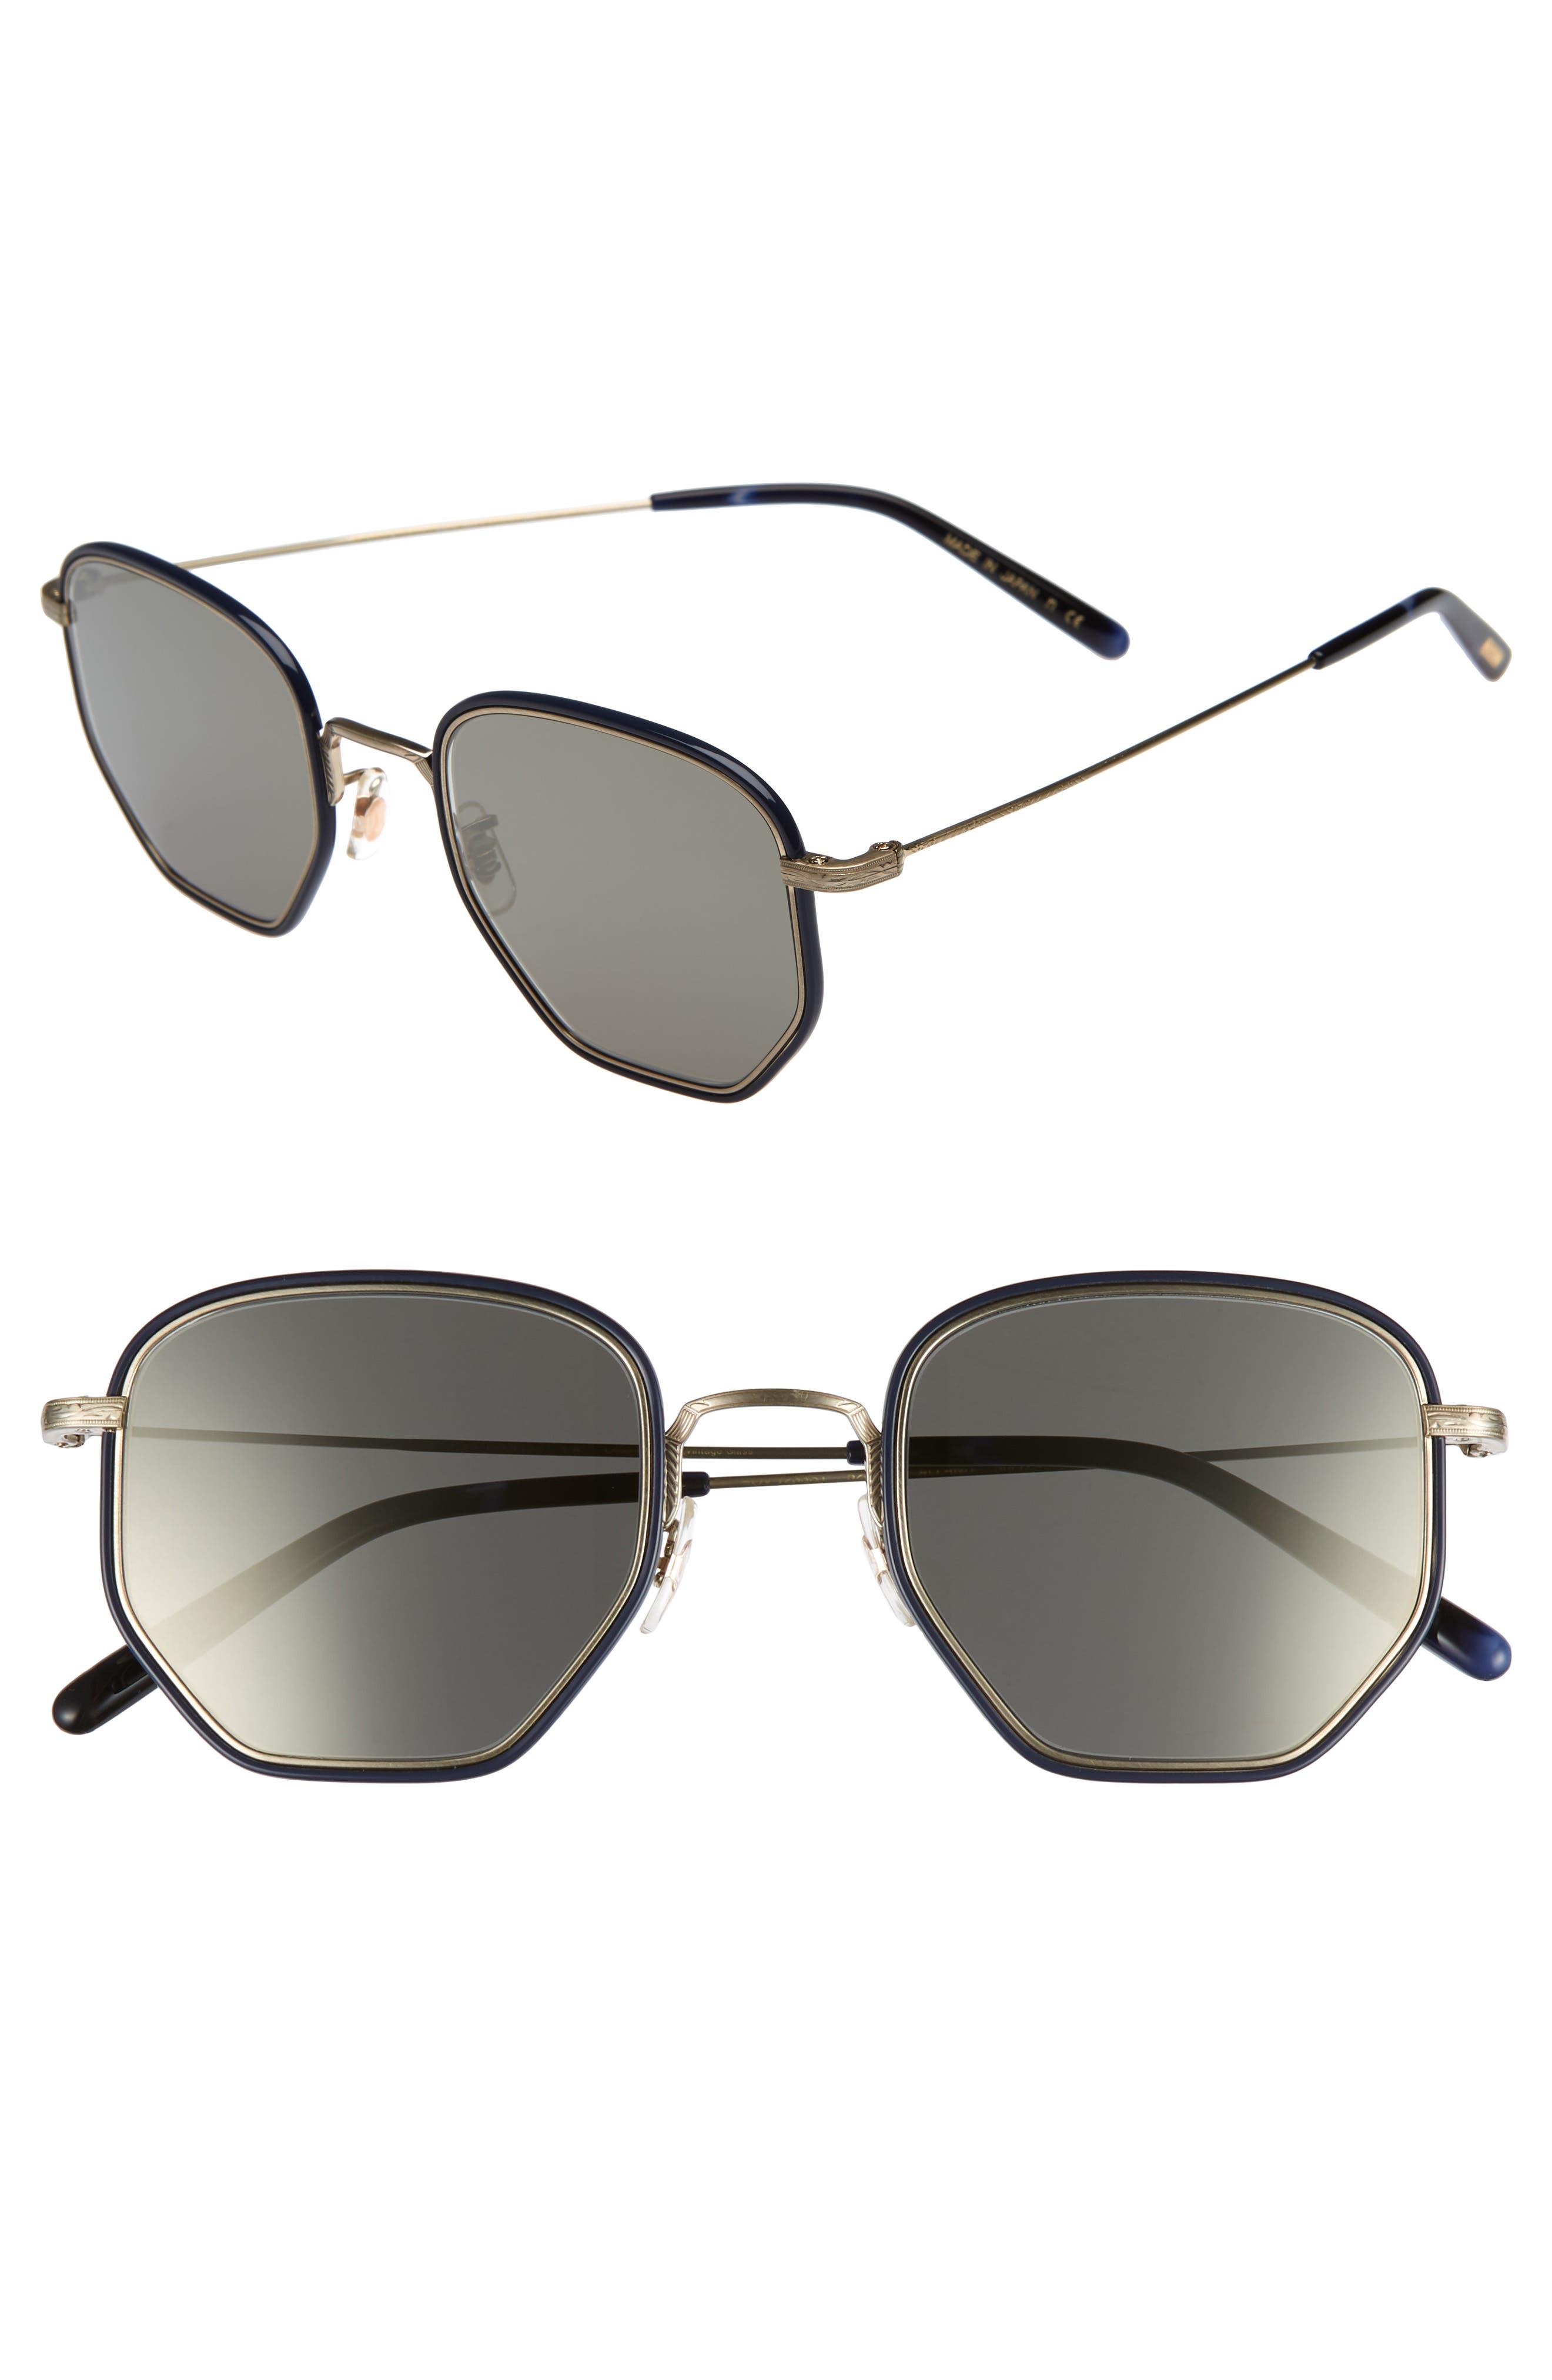 Alland 50mm Sunglasses,                             Main thumbnail 1, color,                             Navy/ Brushed